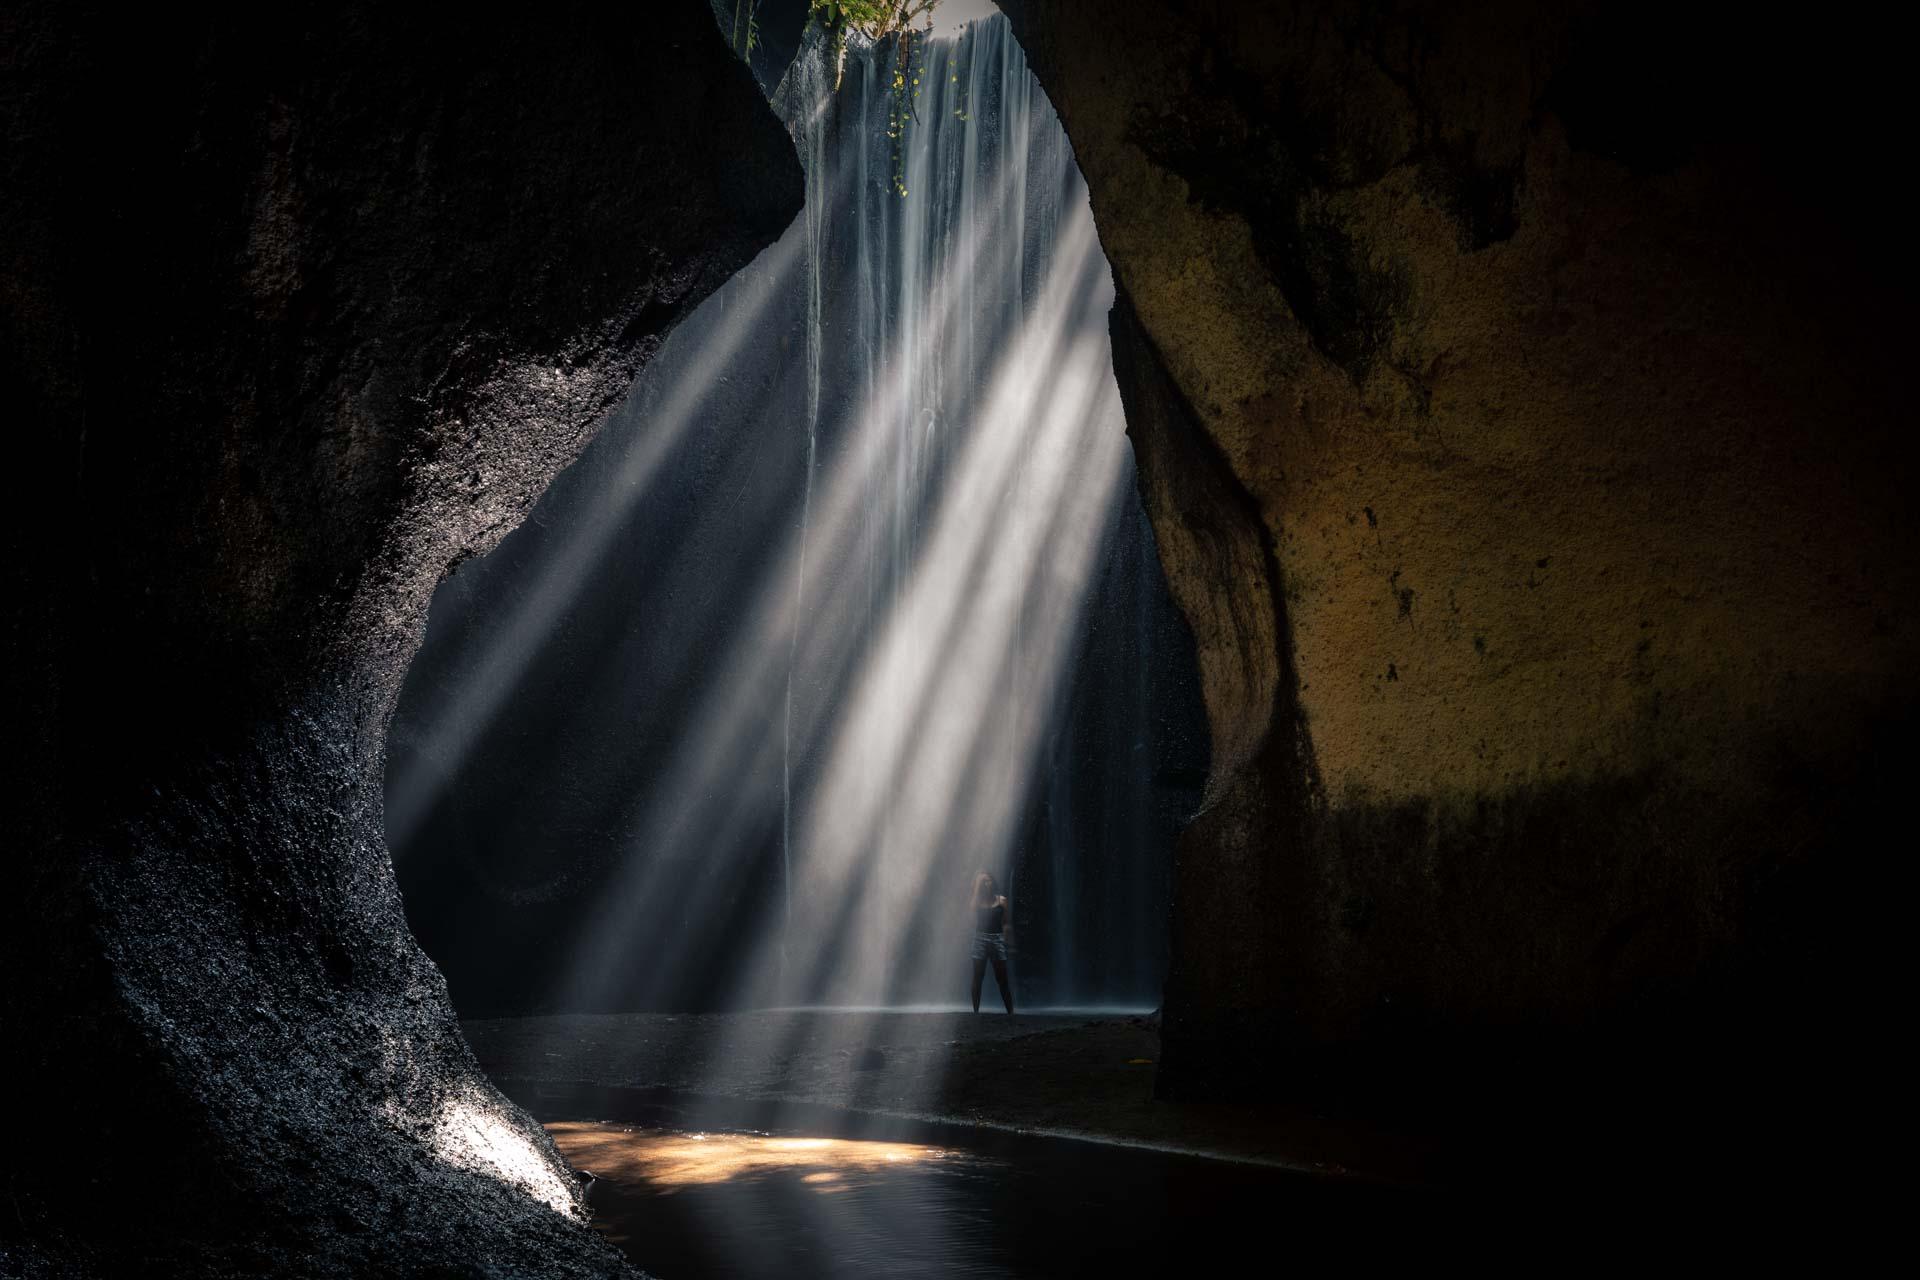 tukad cepung waterfall 8